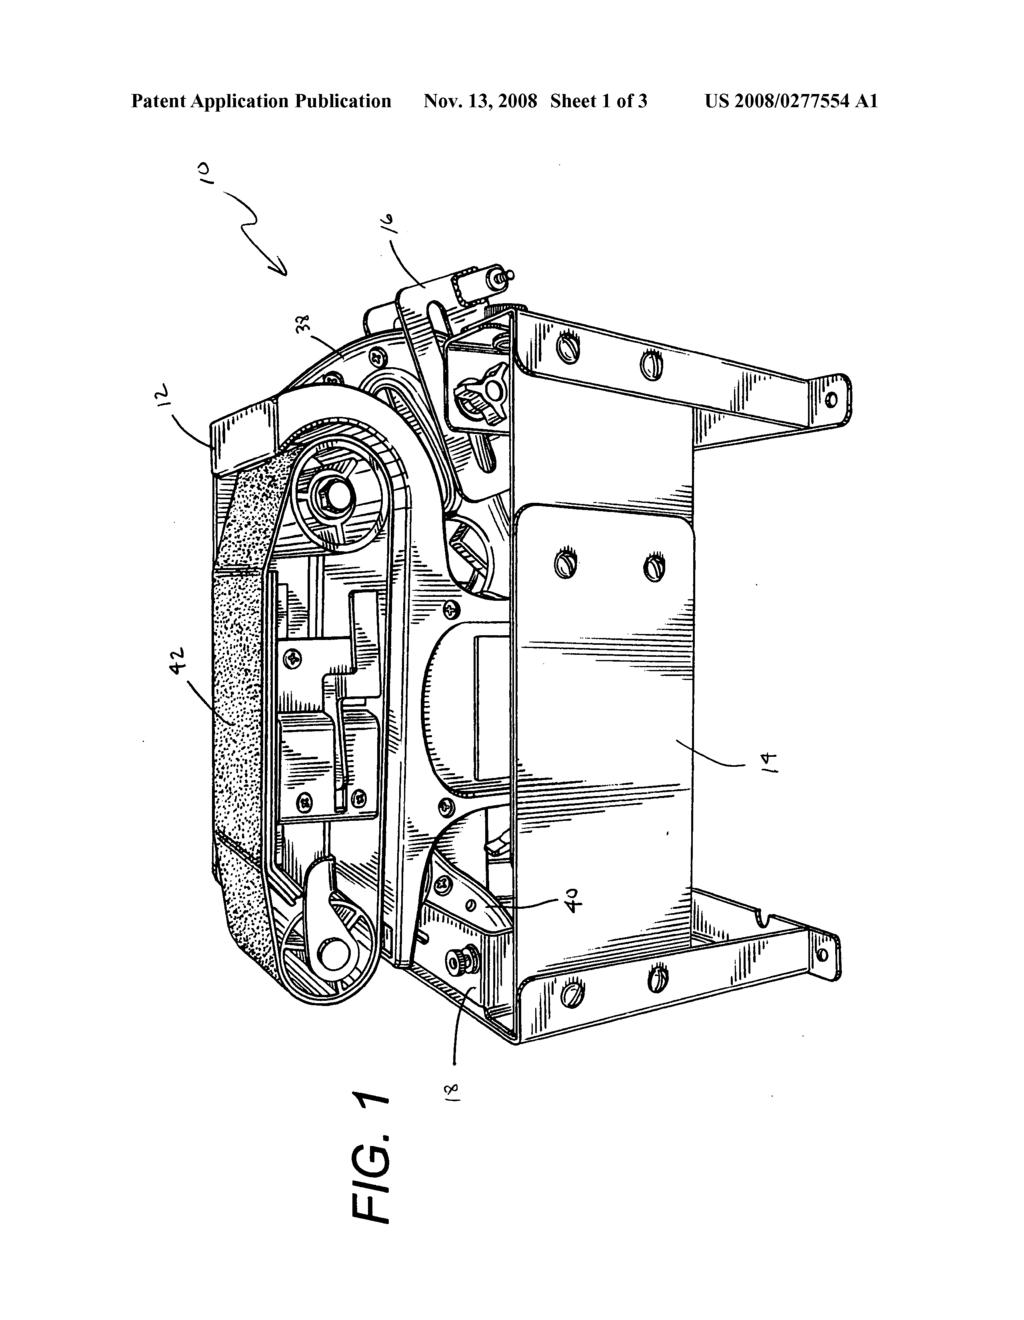 Ridgid Oscillating Edge Belt Spindle Sander Manual